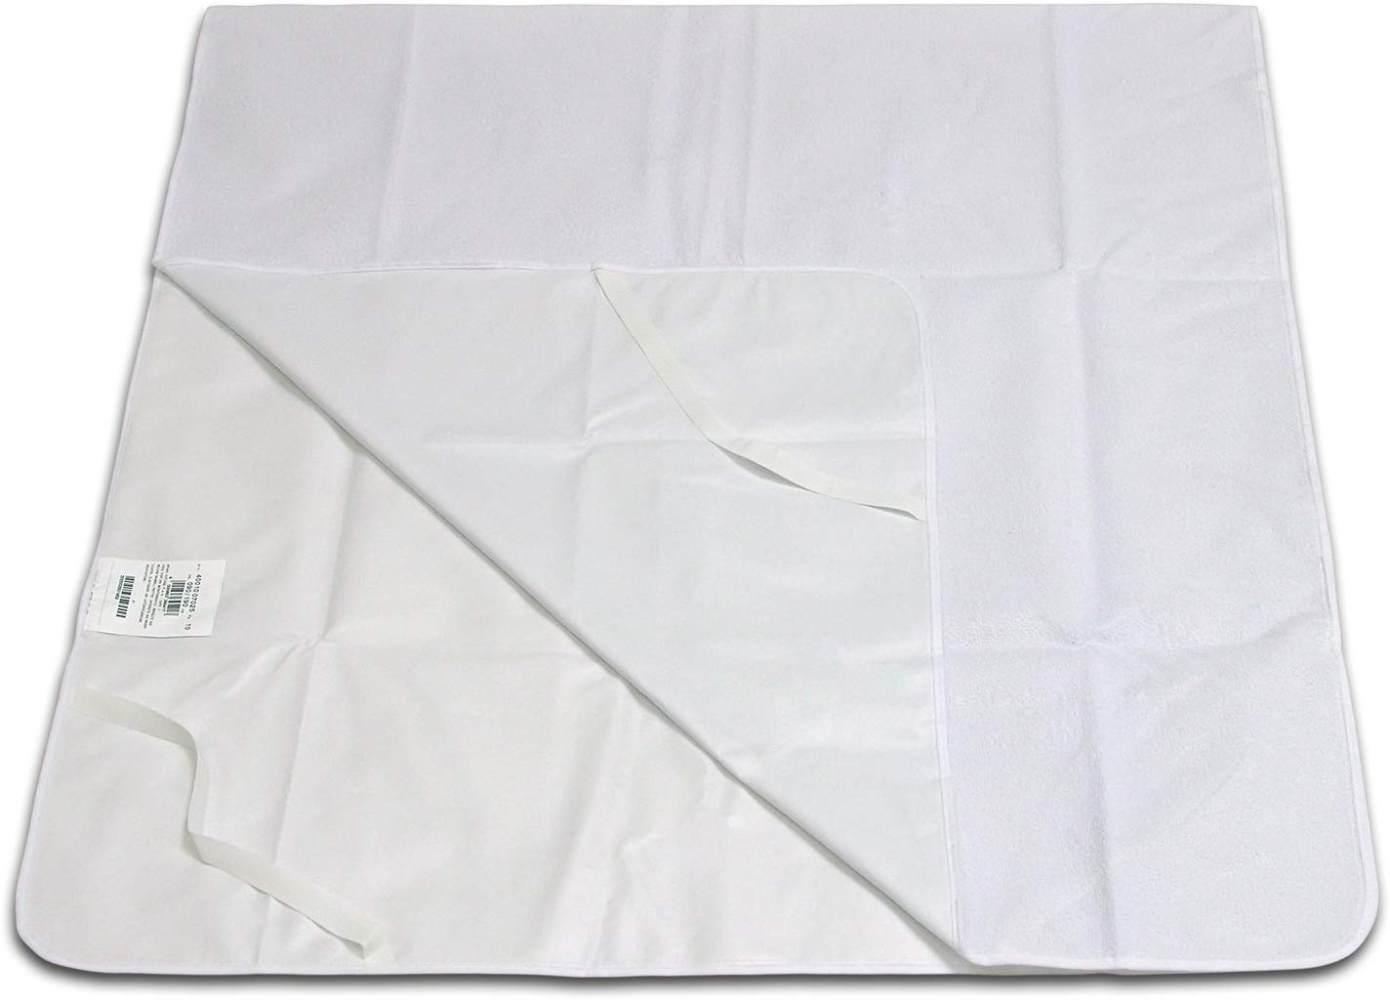 Frankenstolz Matratzenauflage 'Molton' 70 x140 cm Bild 1